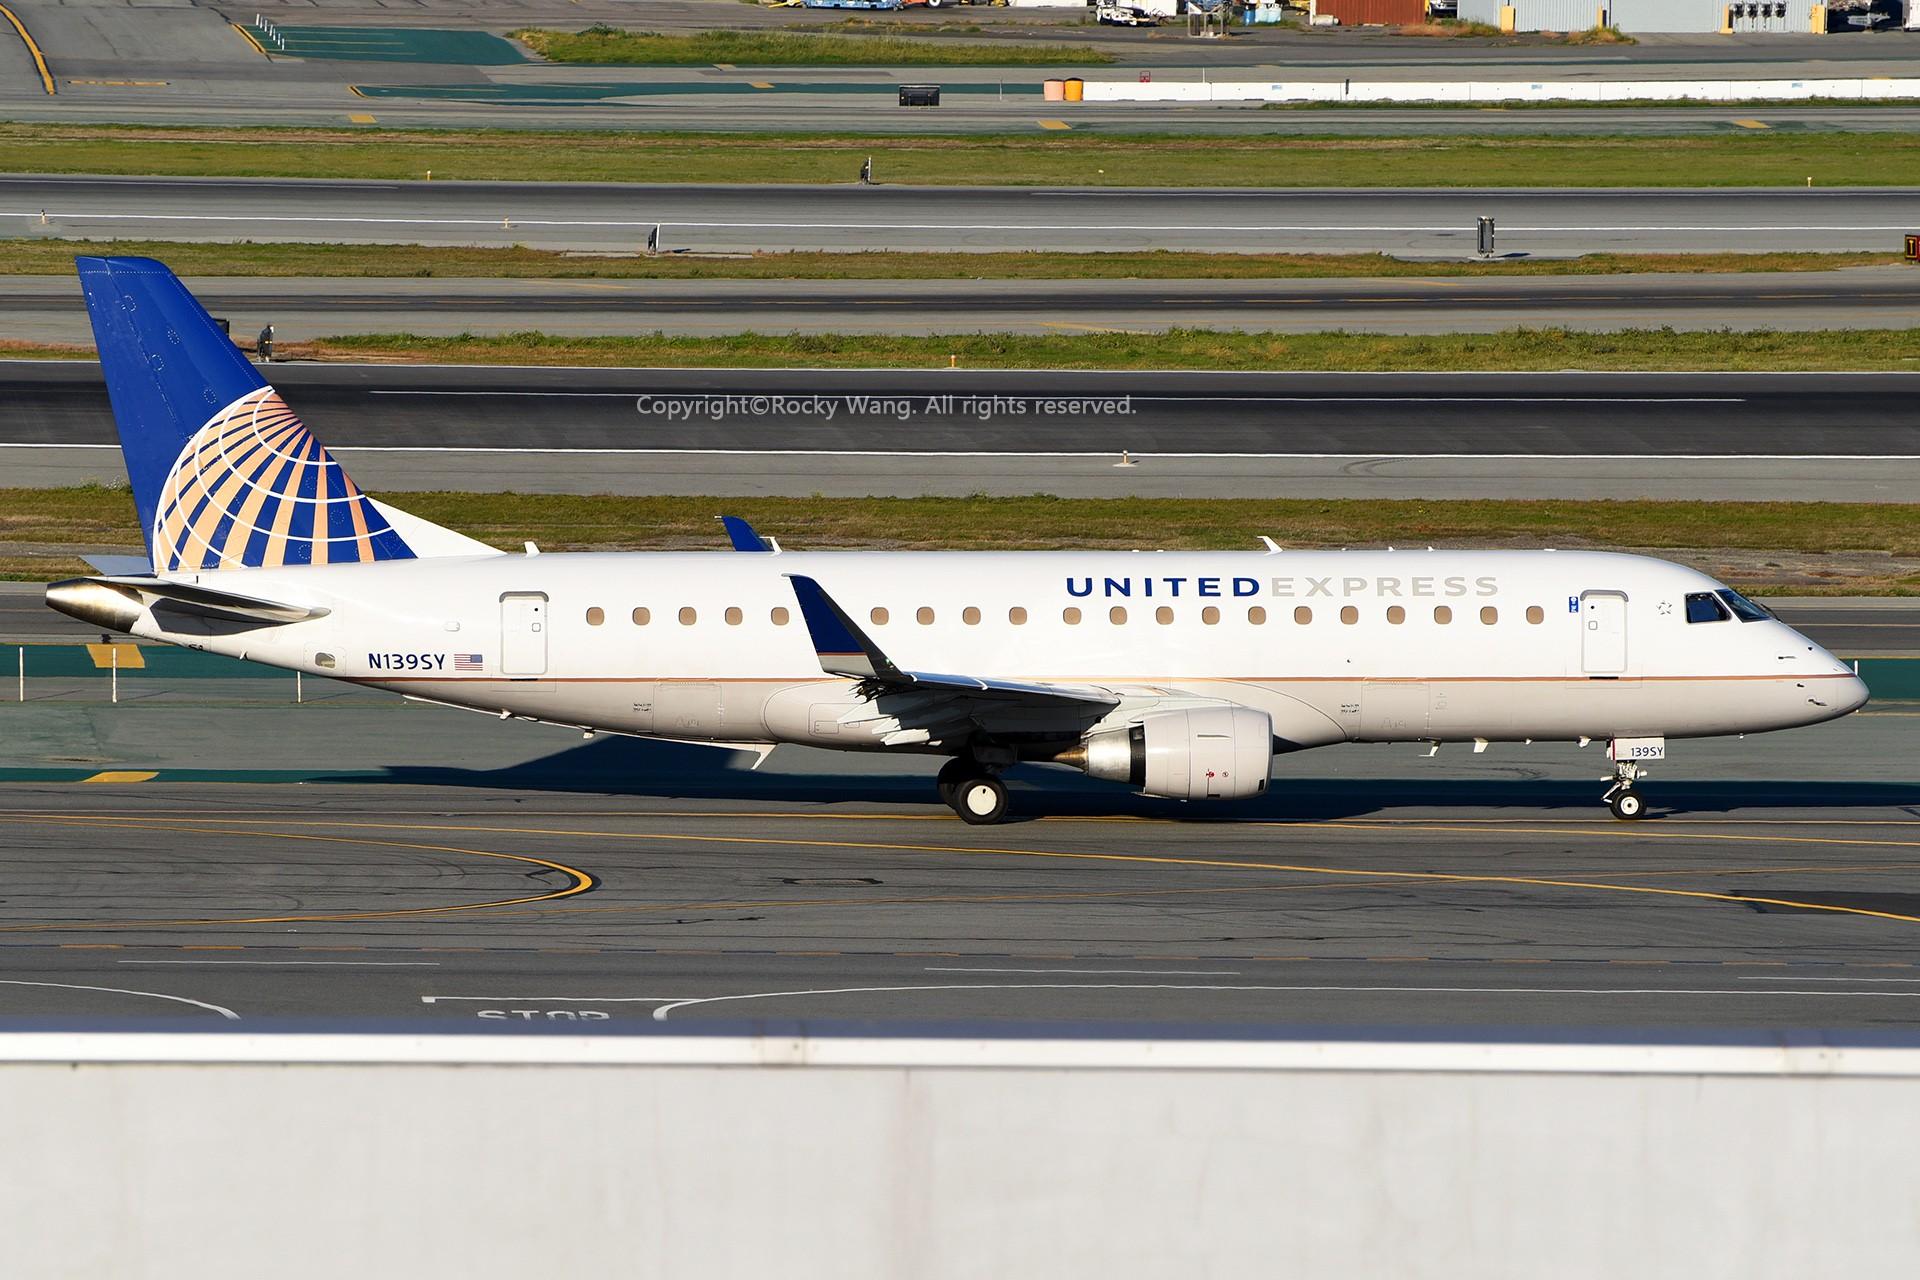 Re:[原创]窄体连连看 EMBRAER 170-200LR N139SY 美国旧金山机场